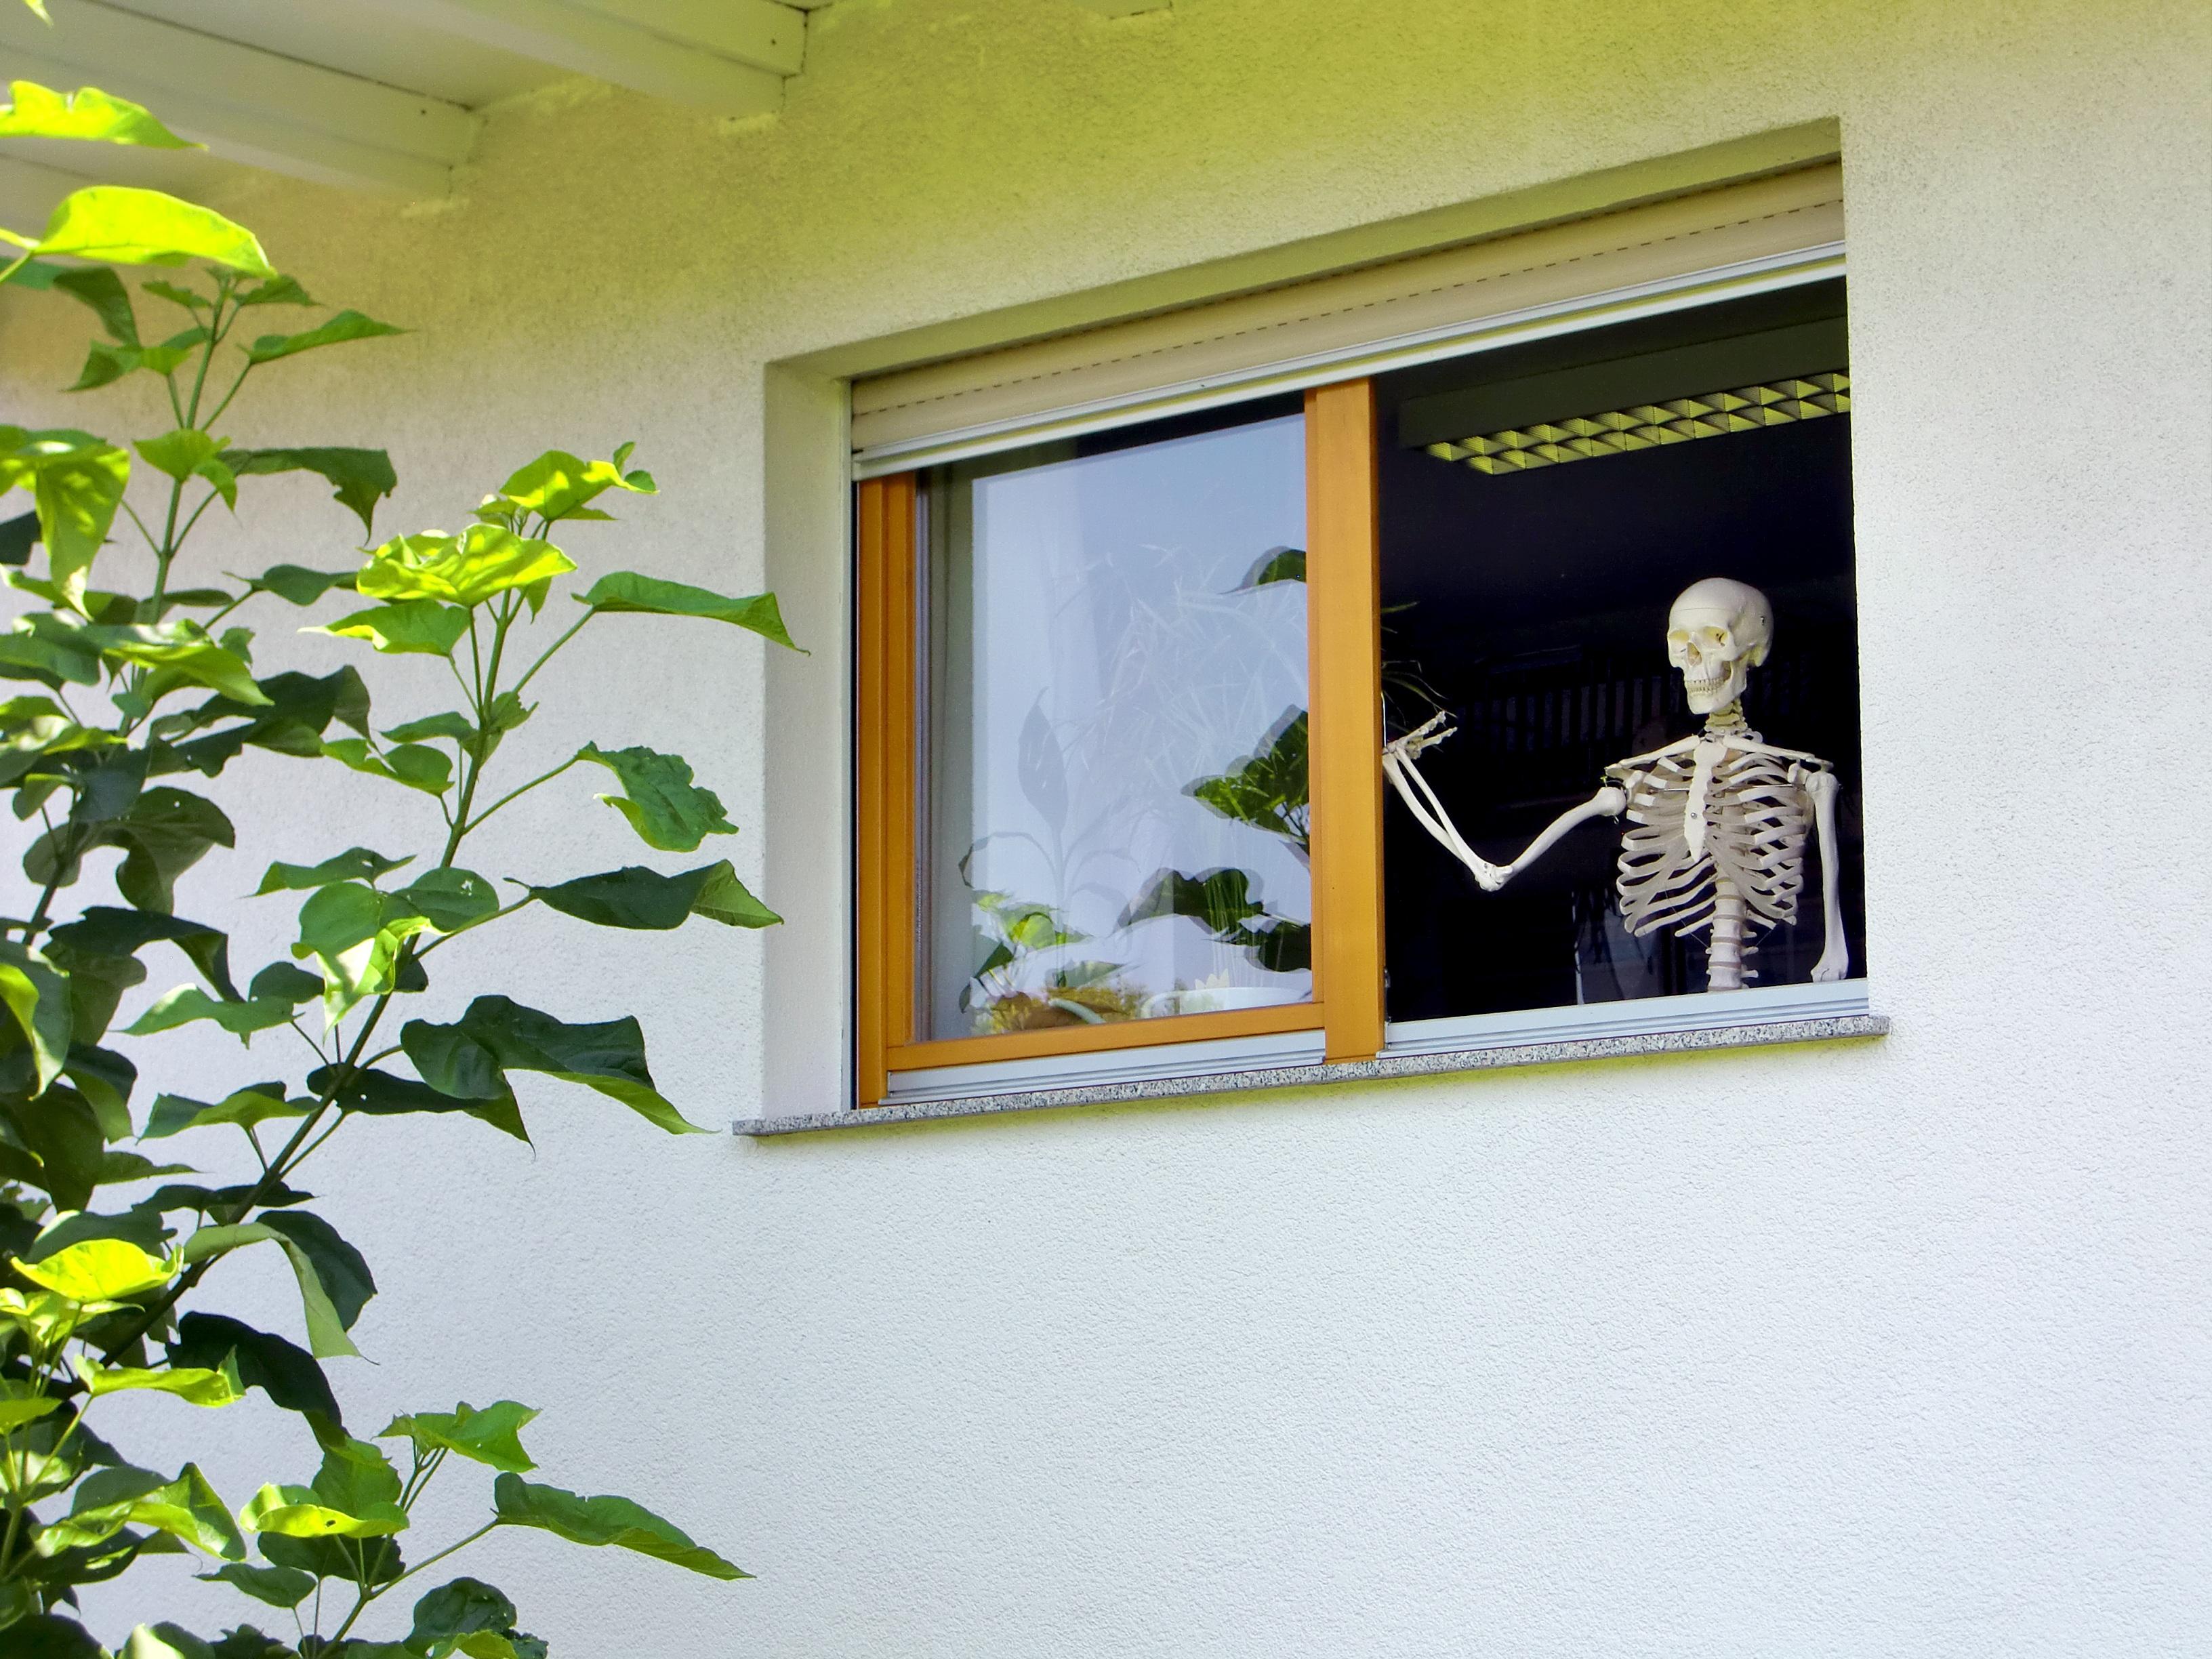 Fotos gratis : ola, pared, mamífero, muerte, diseño de interiores ...